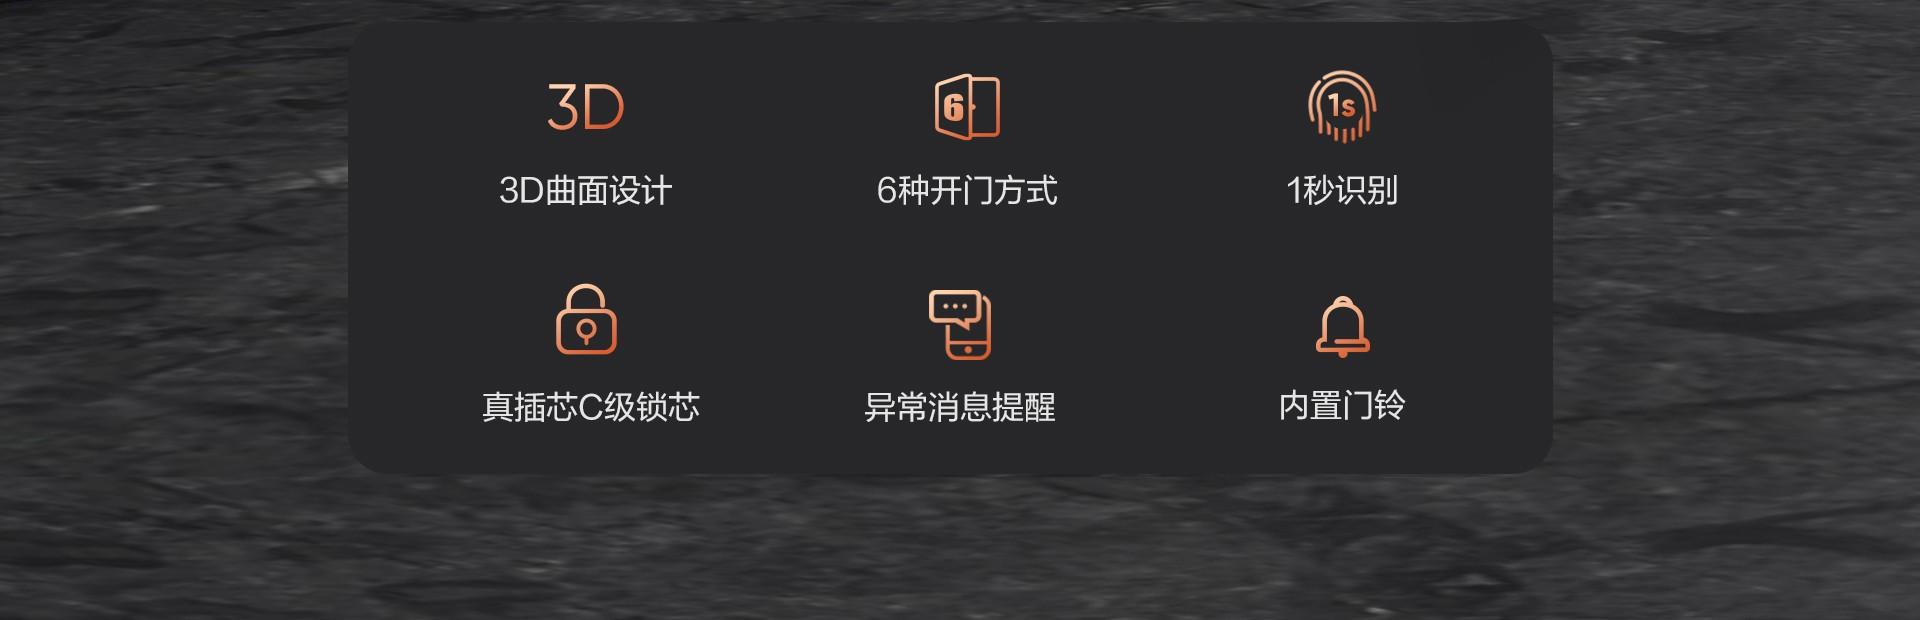 21S-web_02.jpg